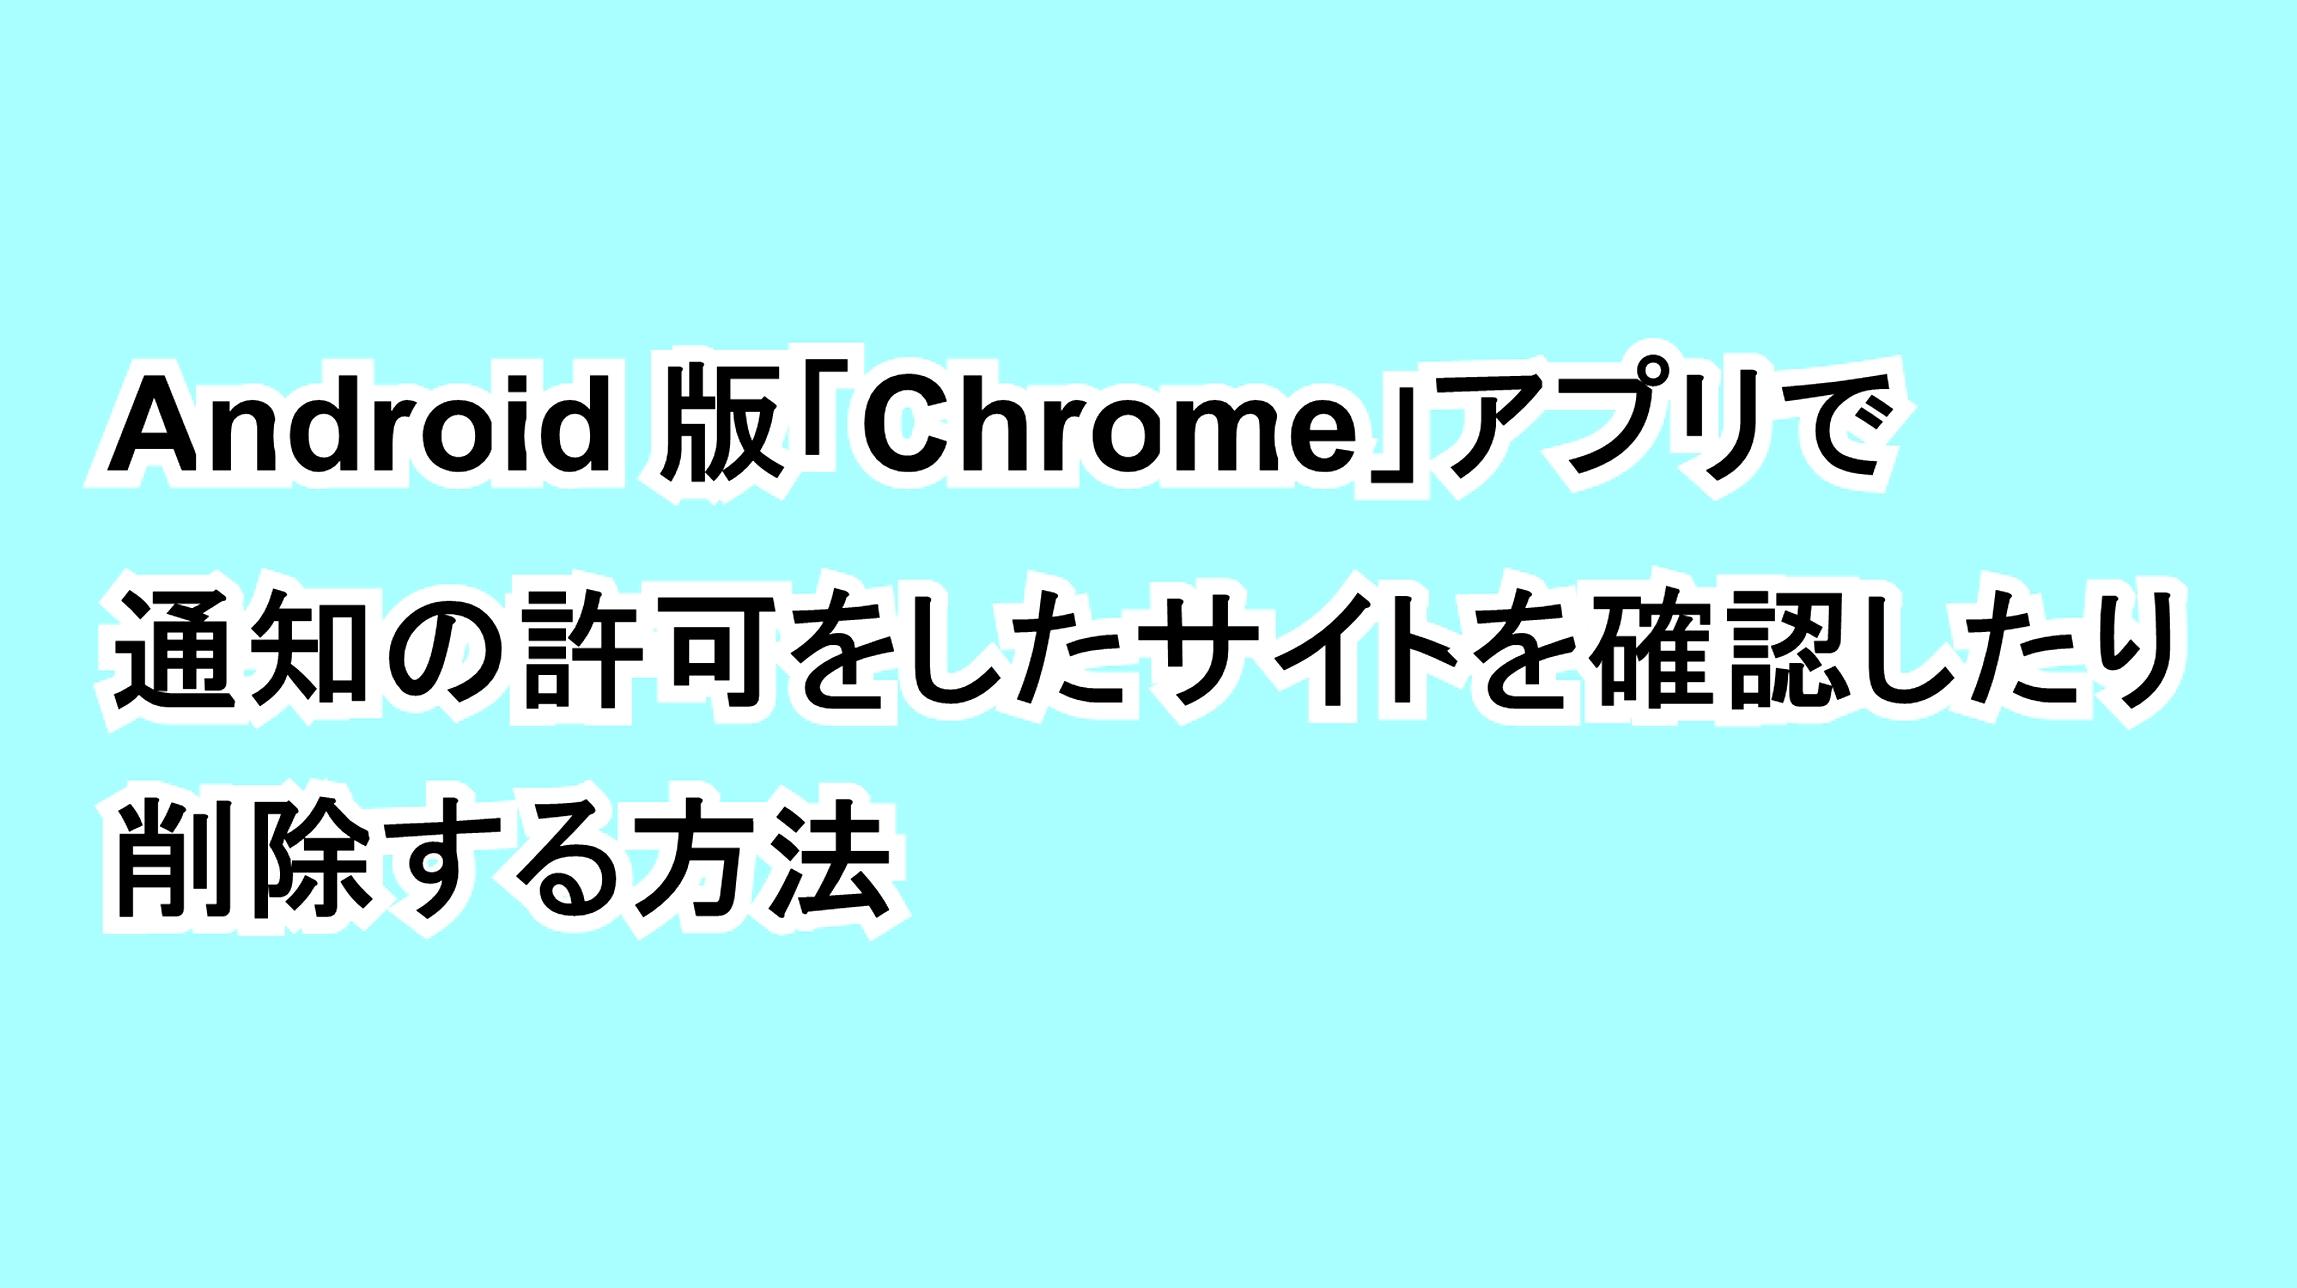 Android版「Chrome」アプリで通知の許可をしたサイトを確認したり削除する方法